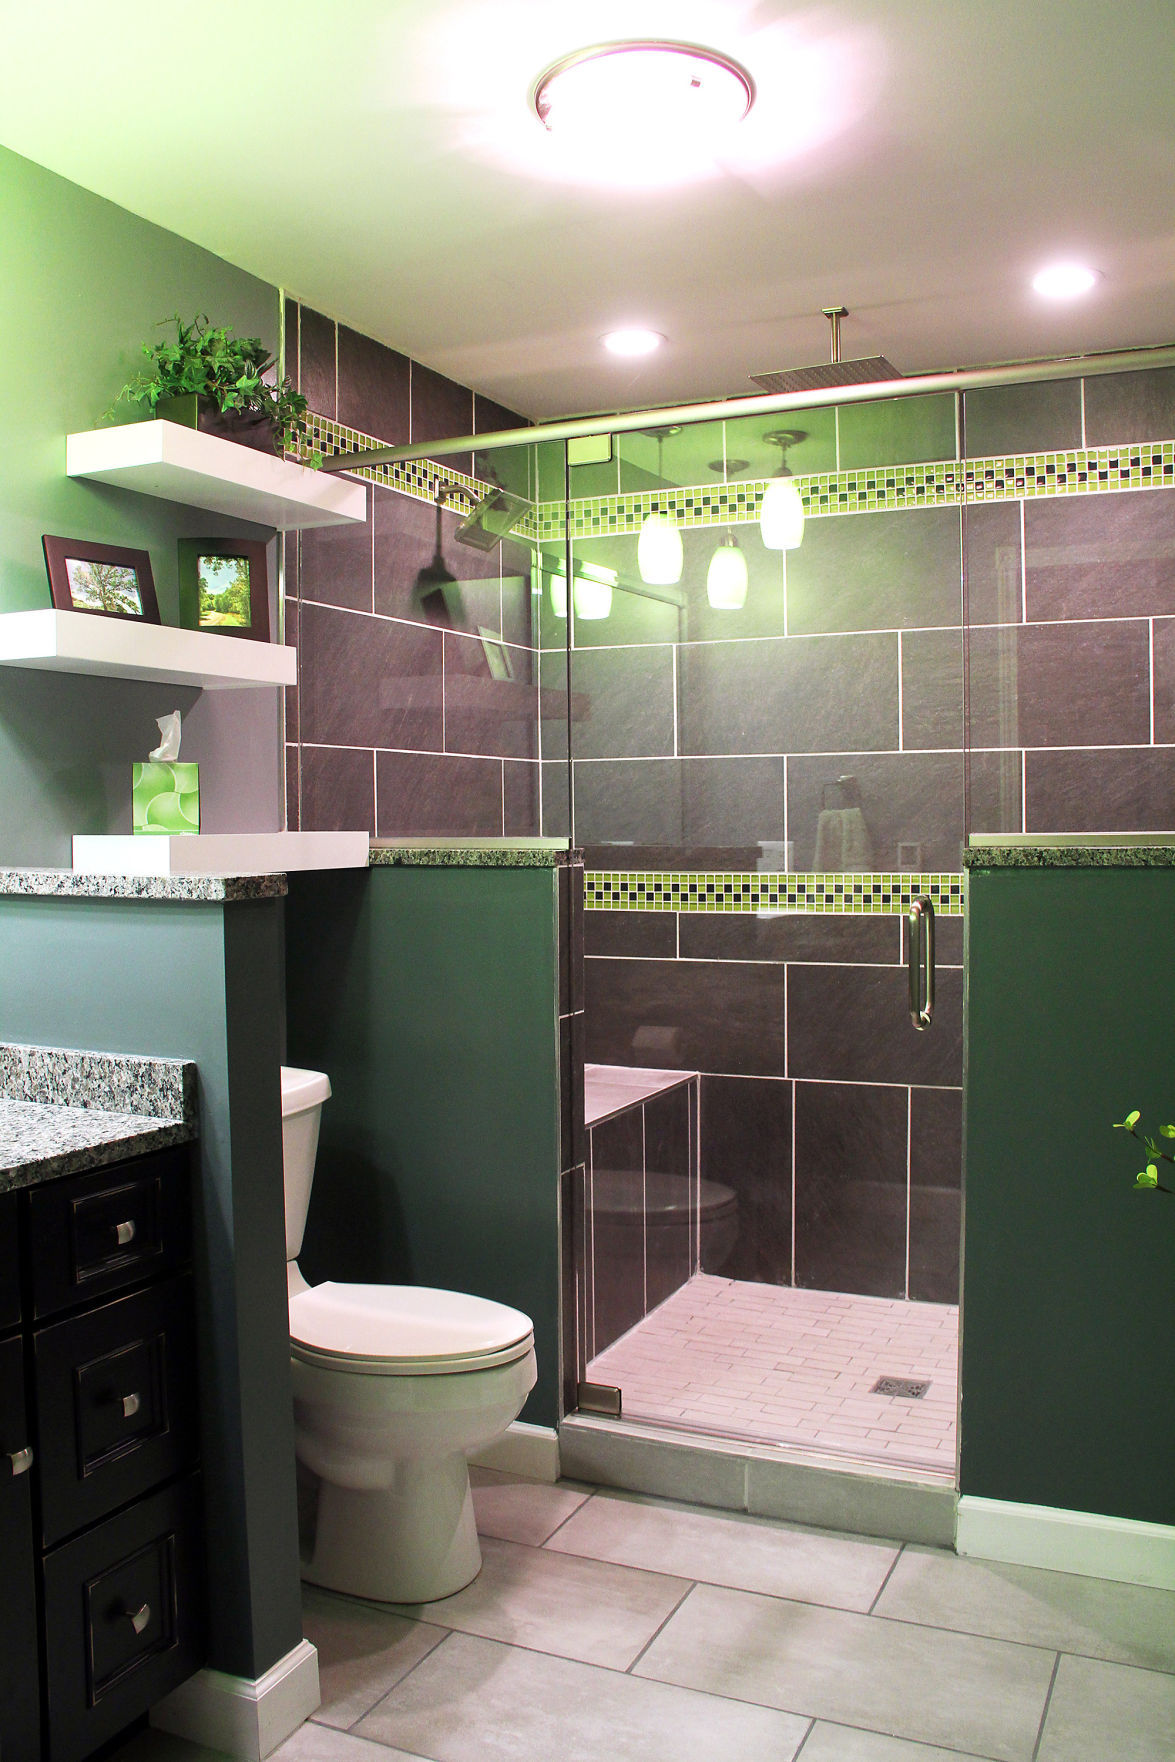 042015-lykam-bathroom-02